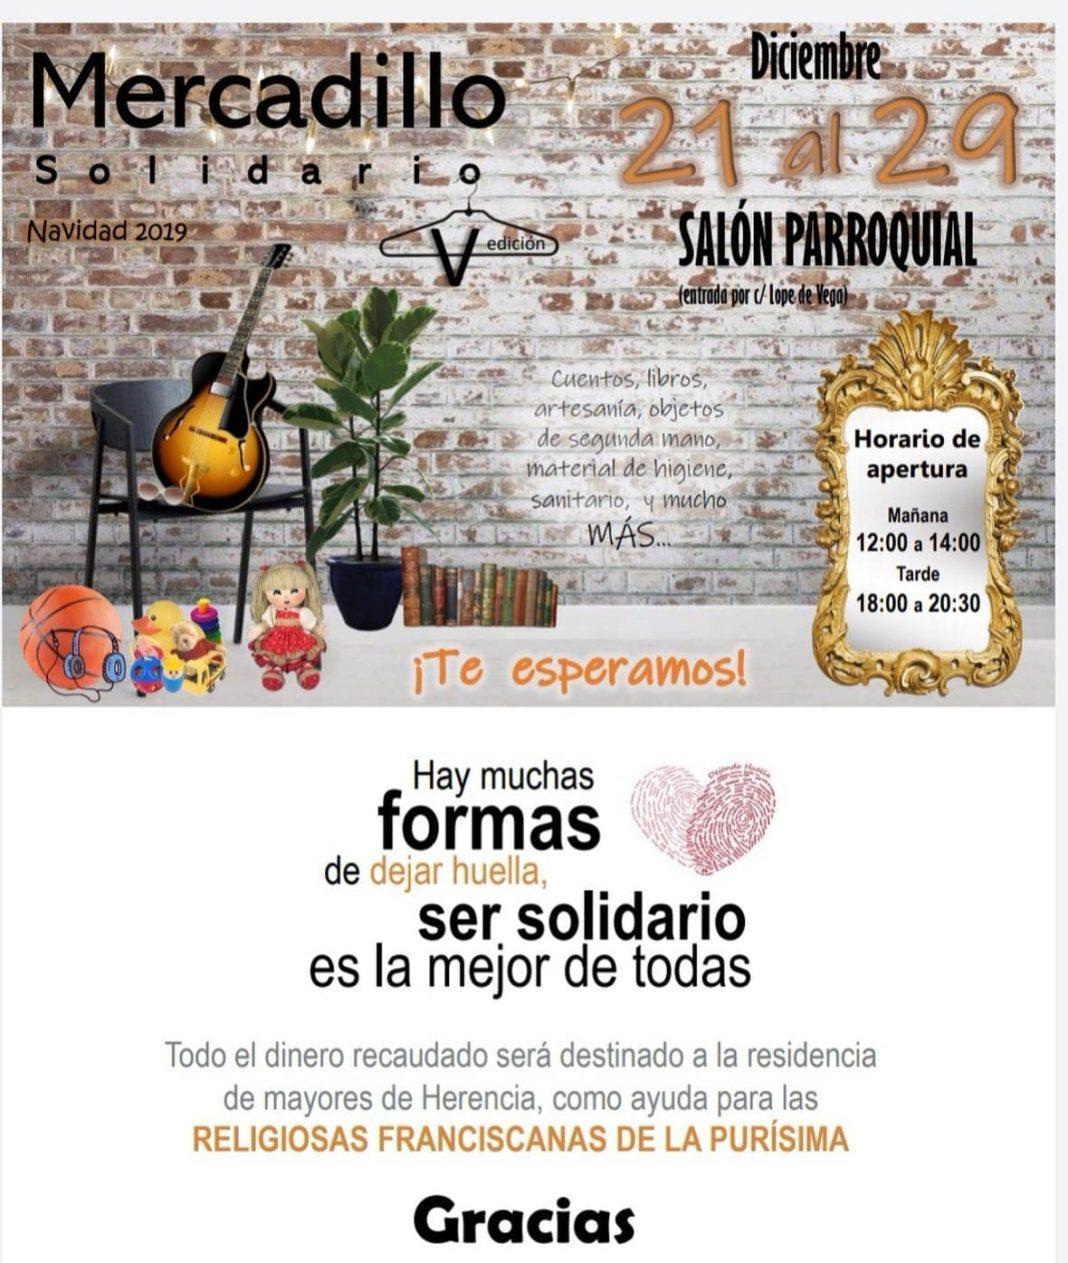 mercadillo solidario 2019 herencia 1068x1263 - Mercadillo Solidario en Herencia esta navidades